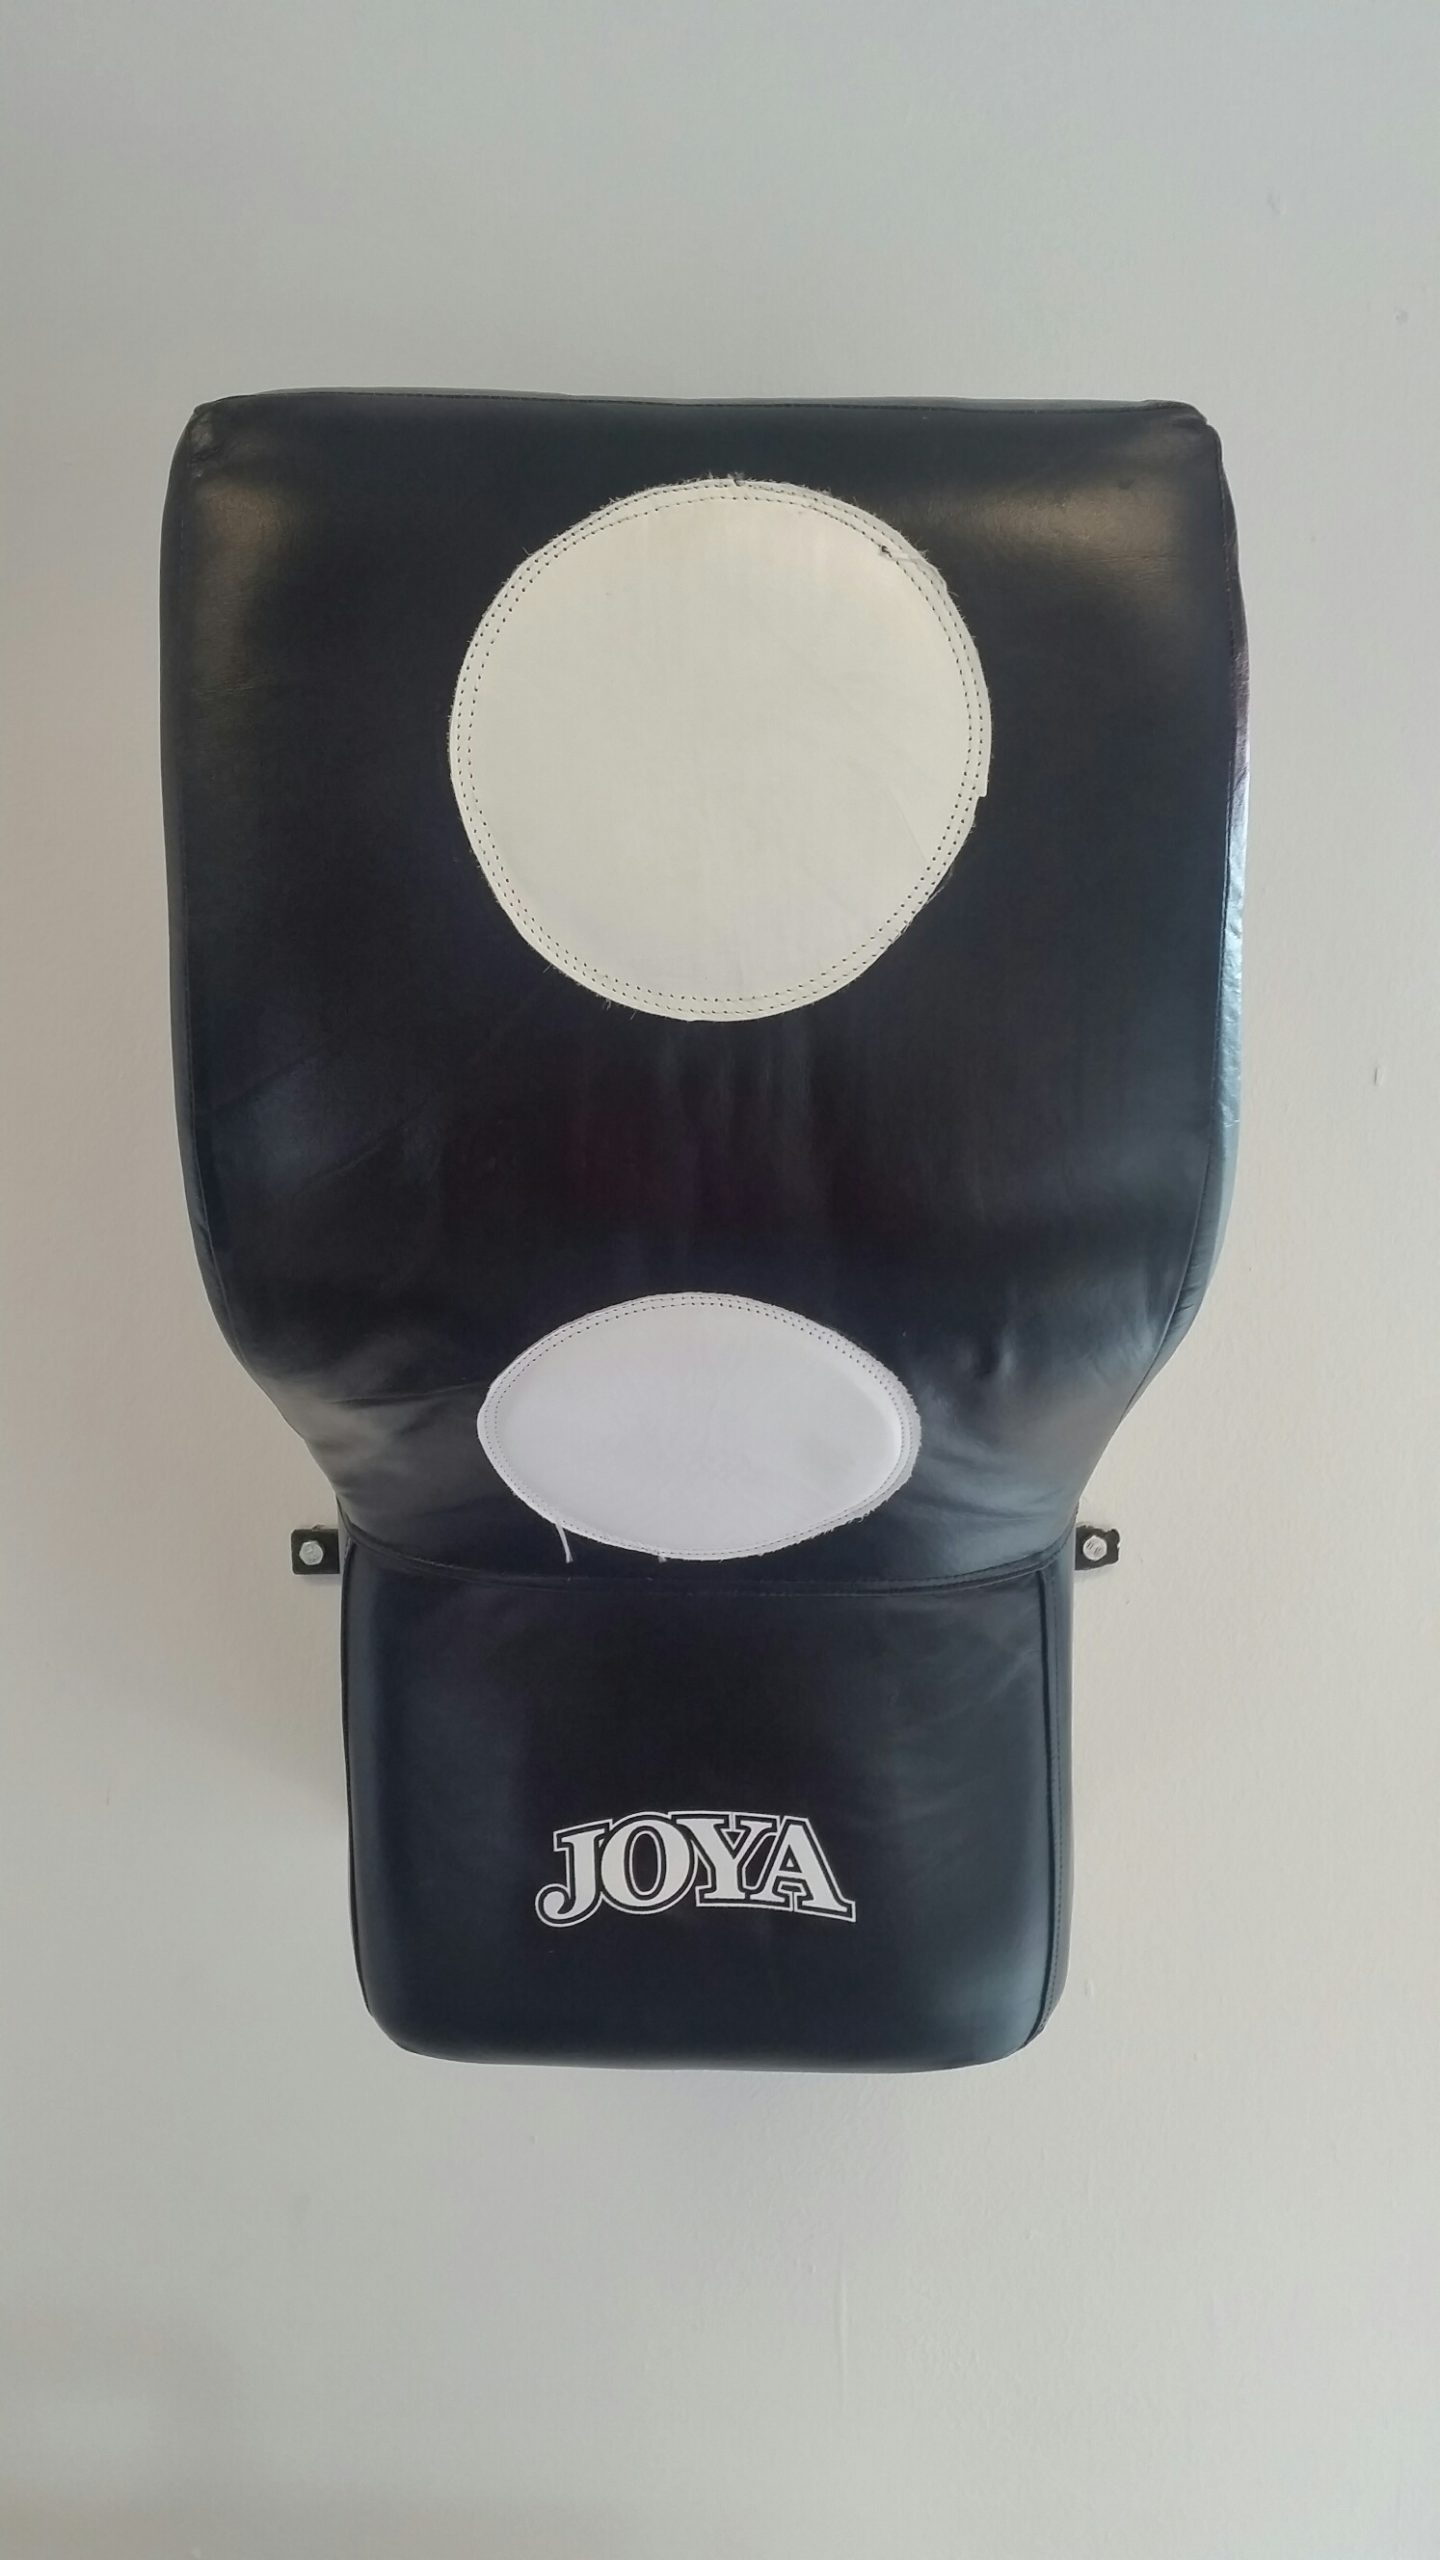 Joya Wall Boxing Bag-541475